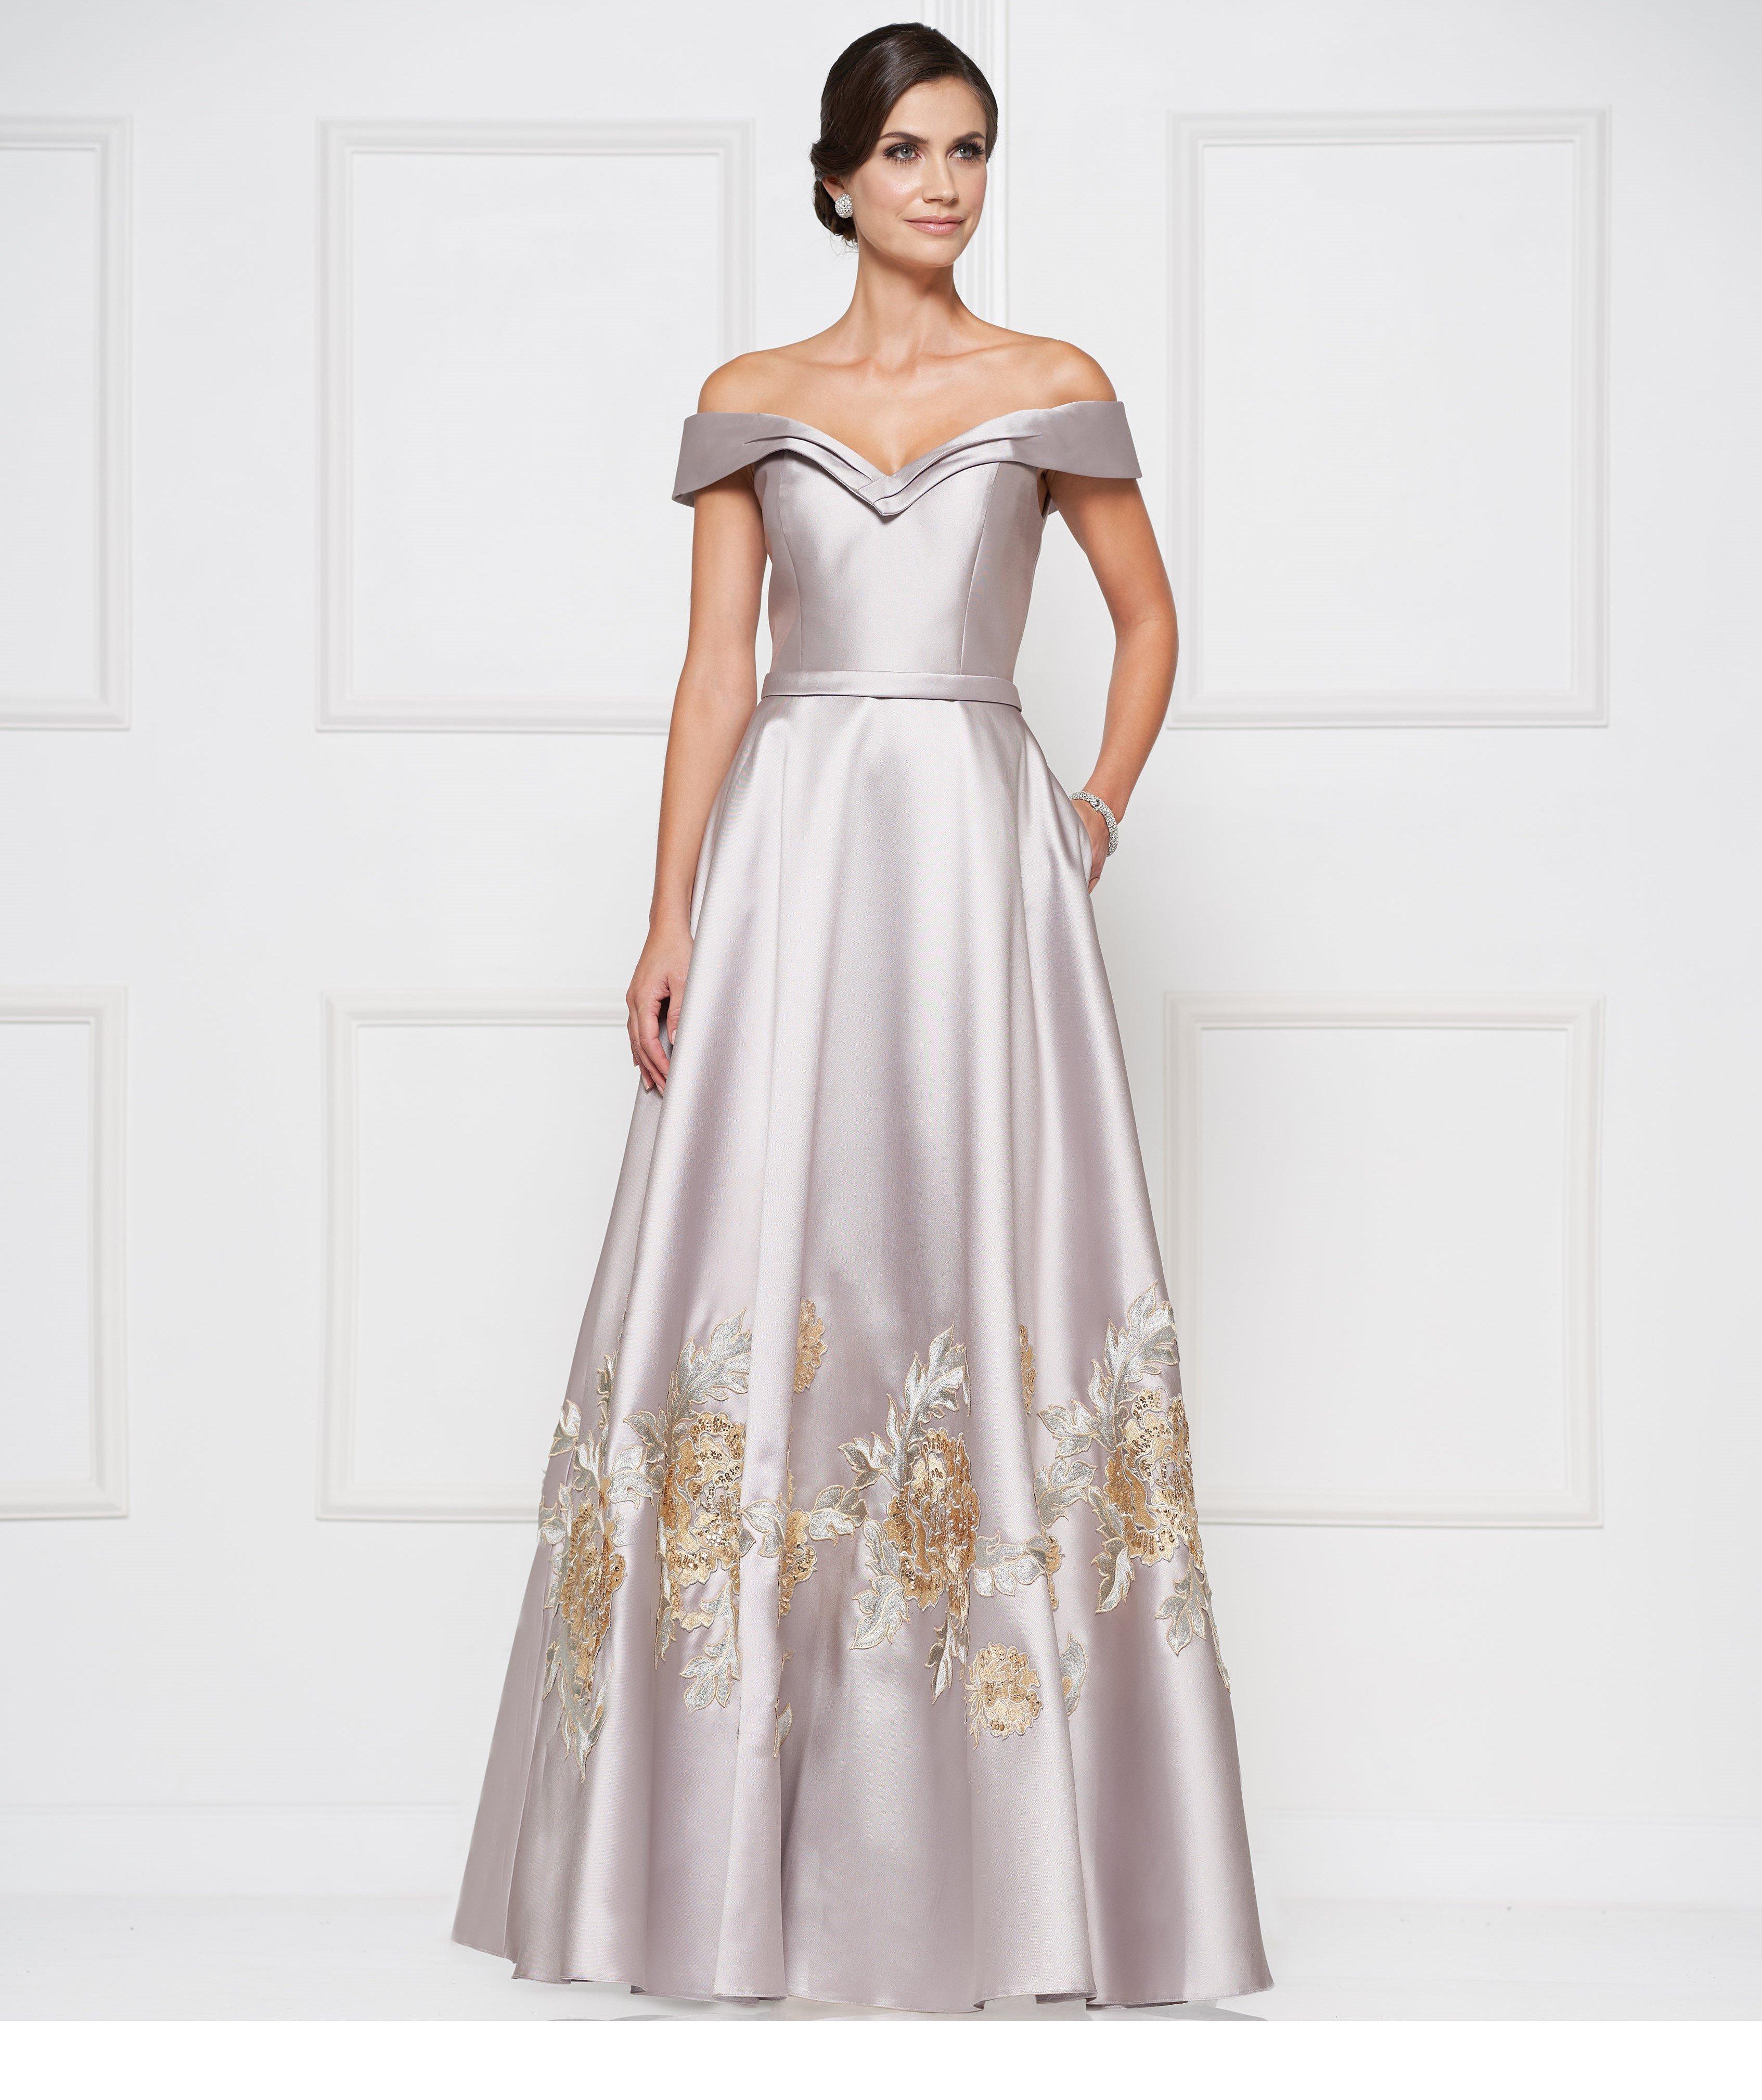 730d04fd6c Bridal Formal Gowns